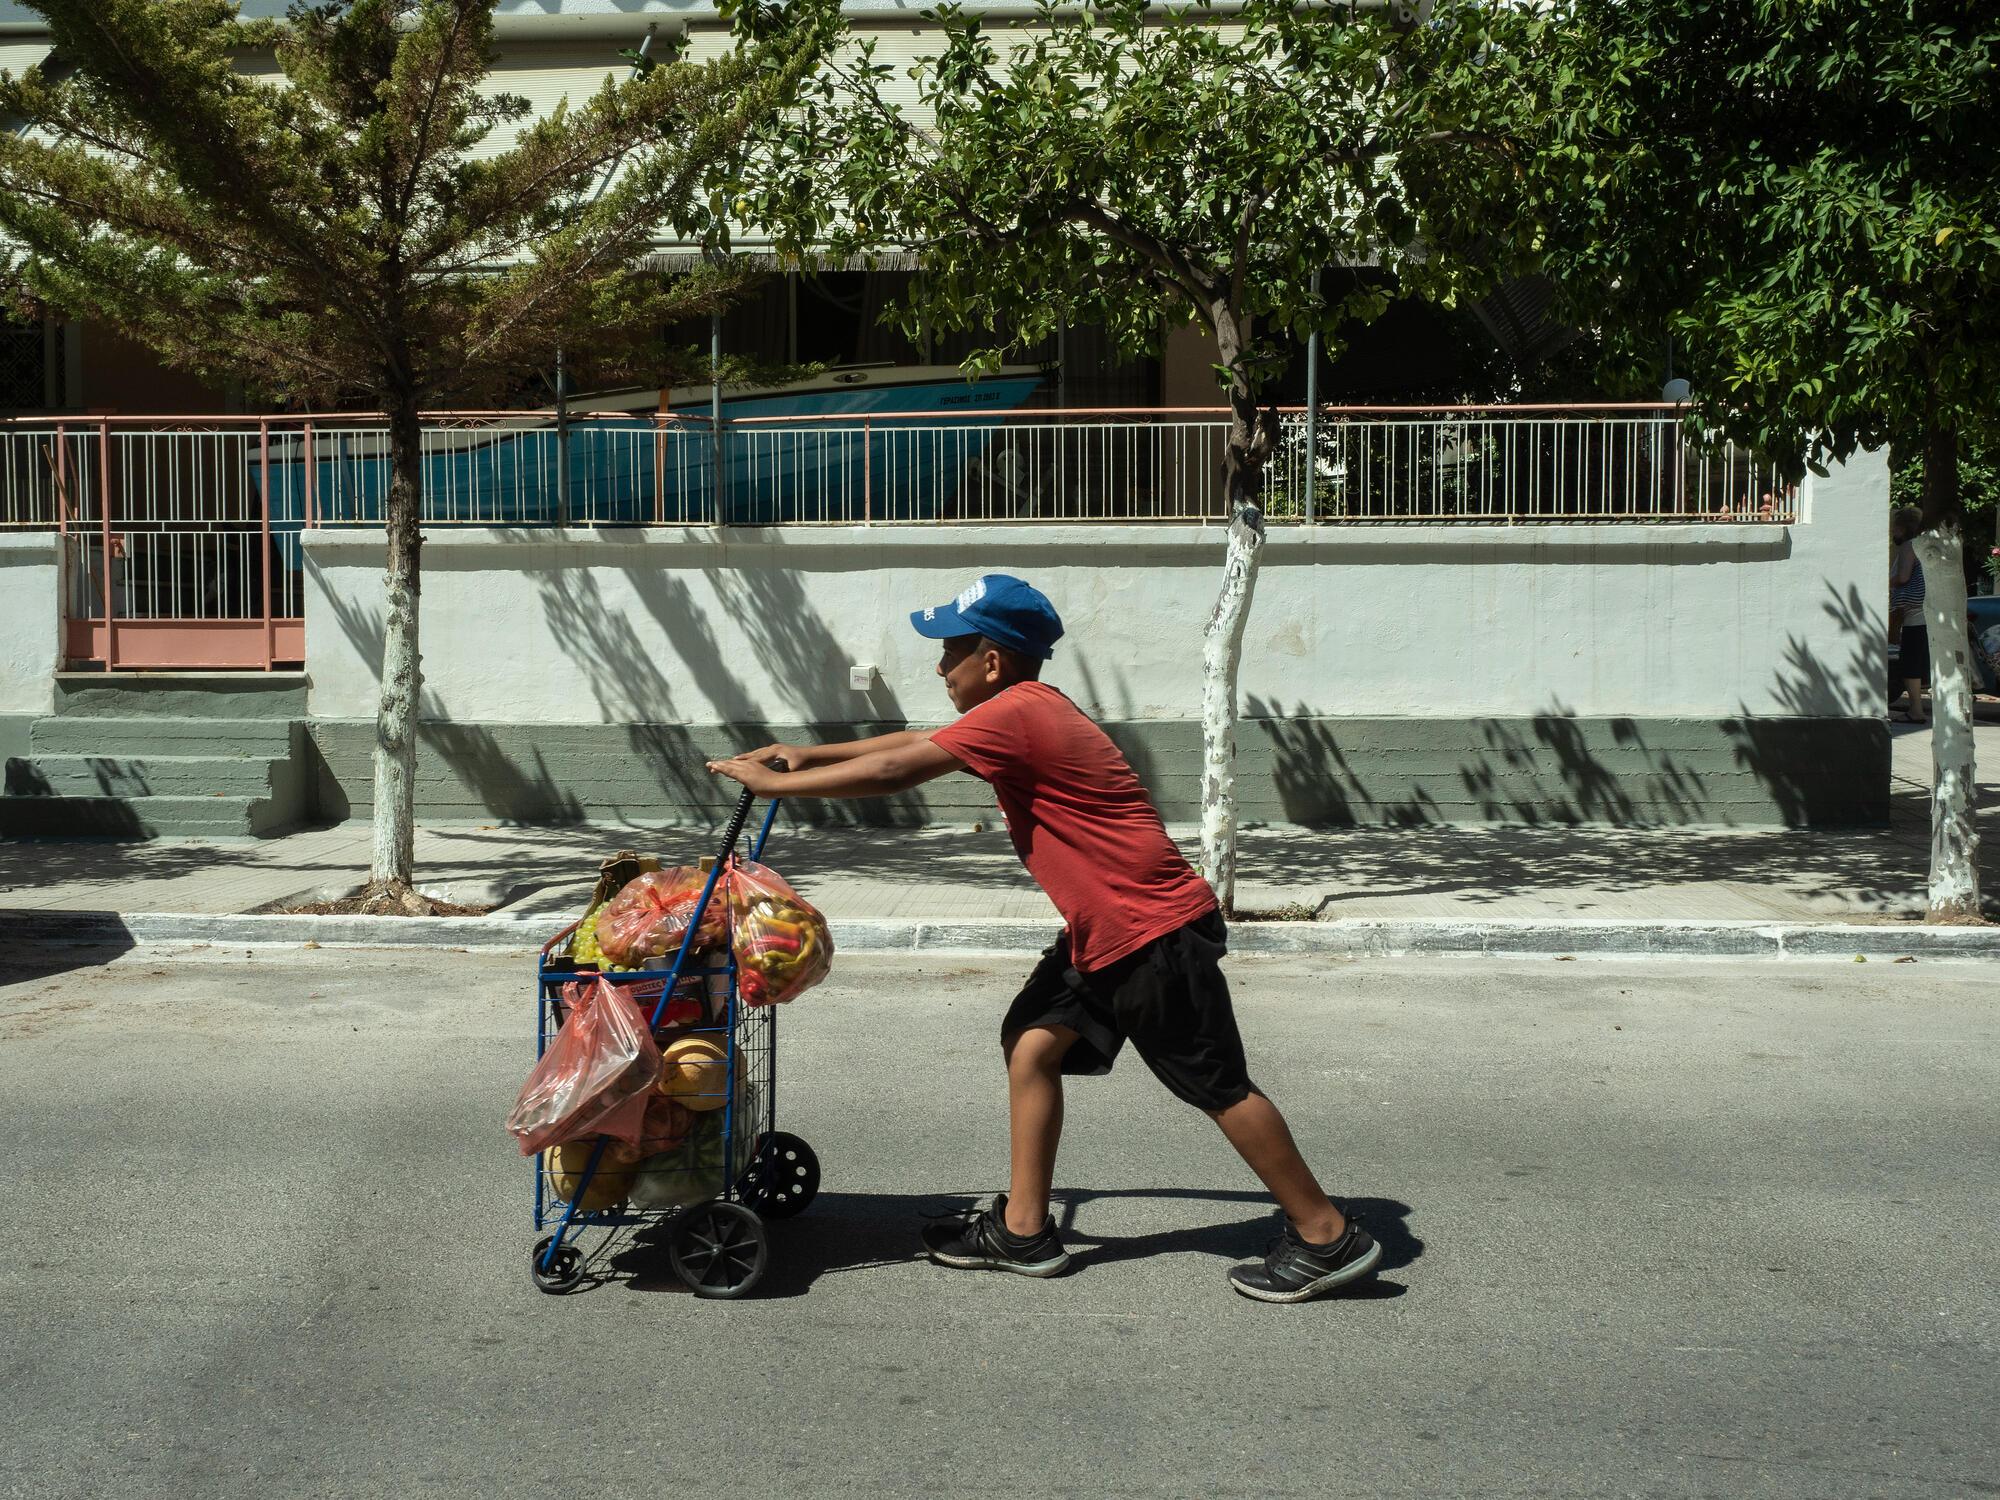 L'un des fils d'Aboo Abdul dans les rues d'Athènes, août 2020, crédit : Enri CANAJ/MAGNUM Photos